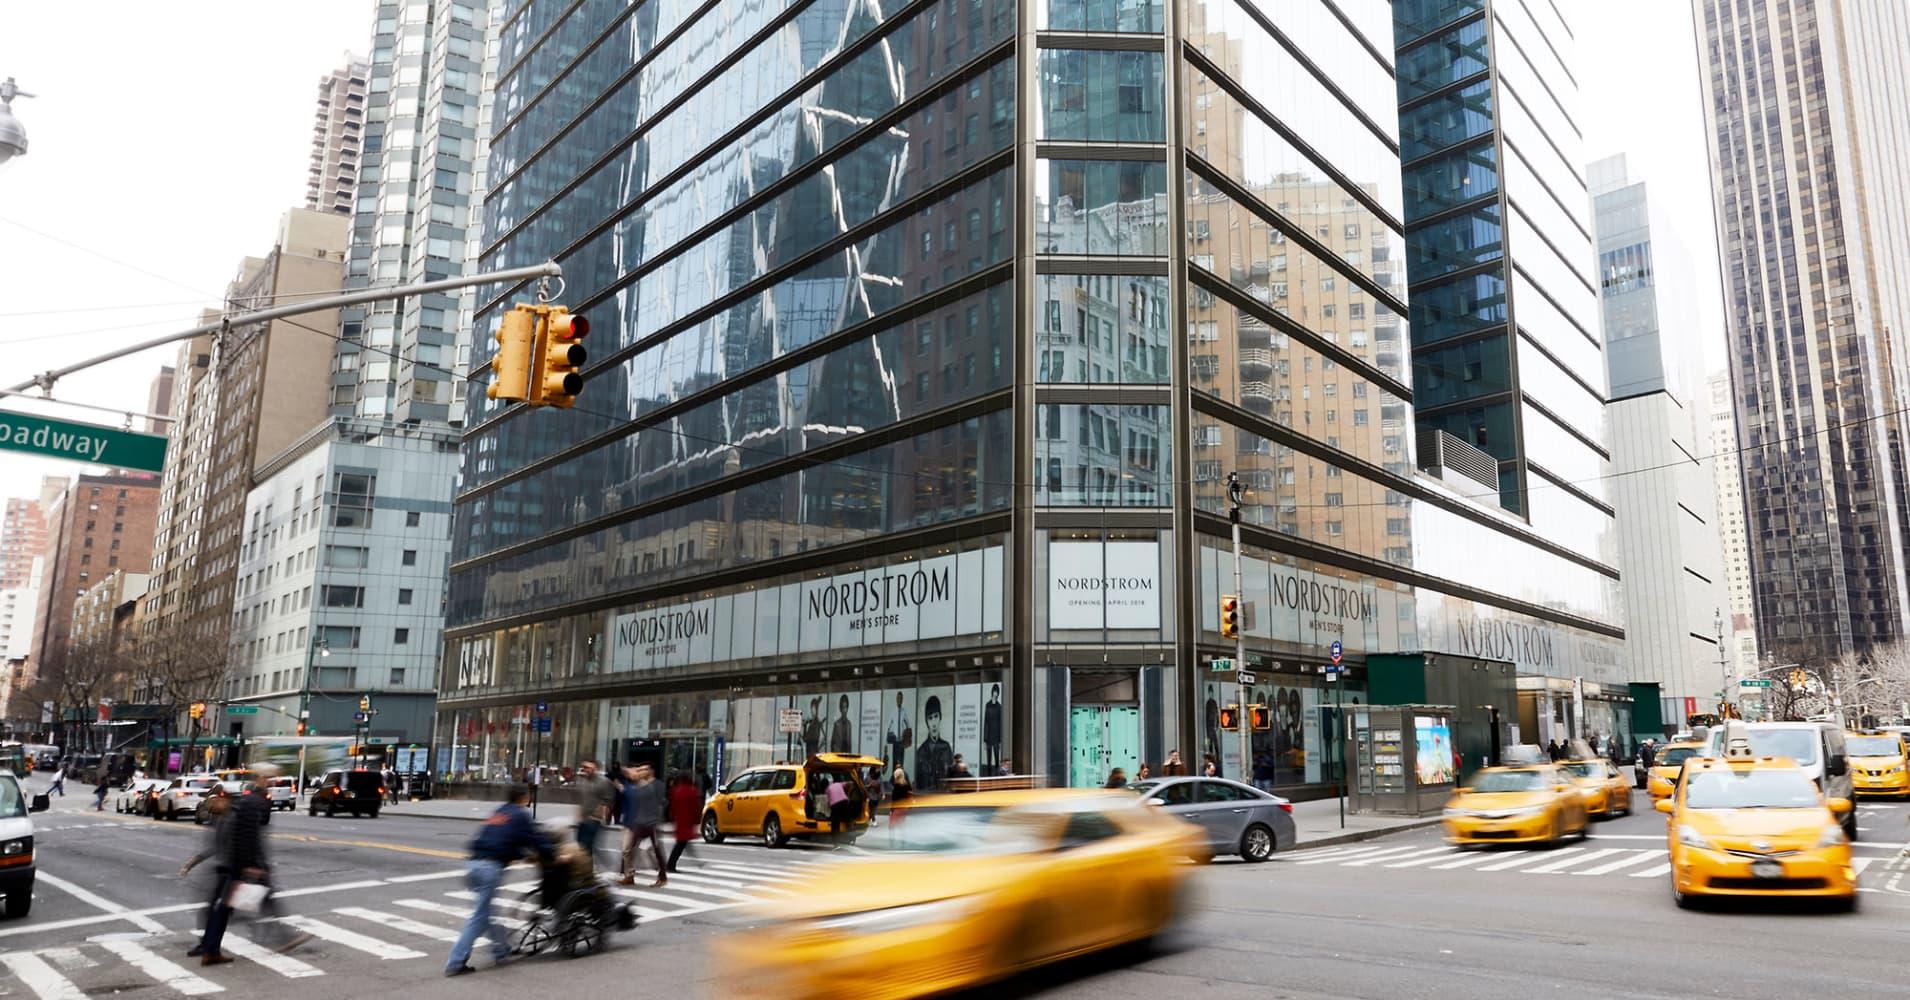 Nordstrom Men's Store NYC exterior.